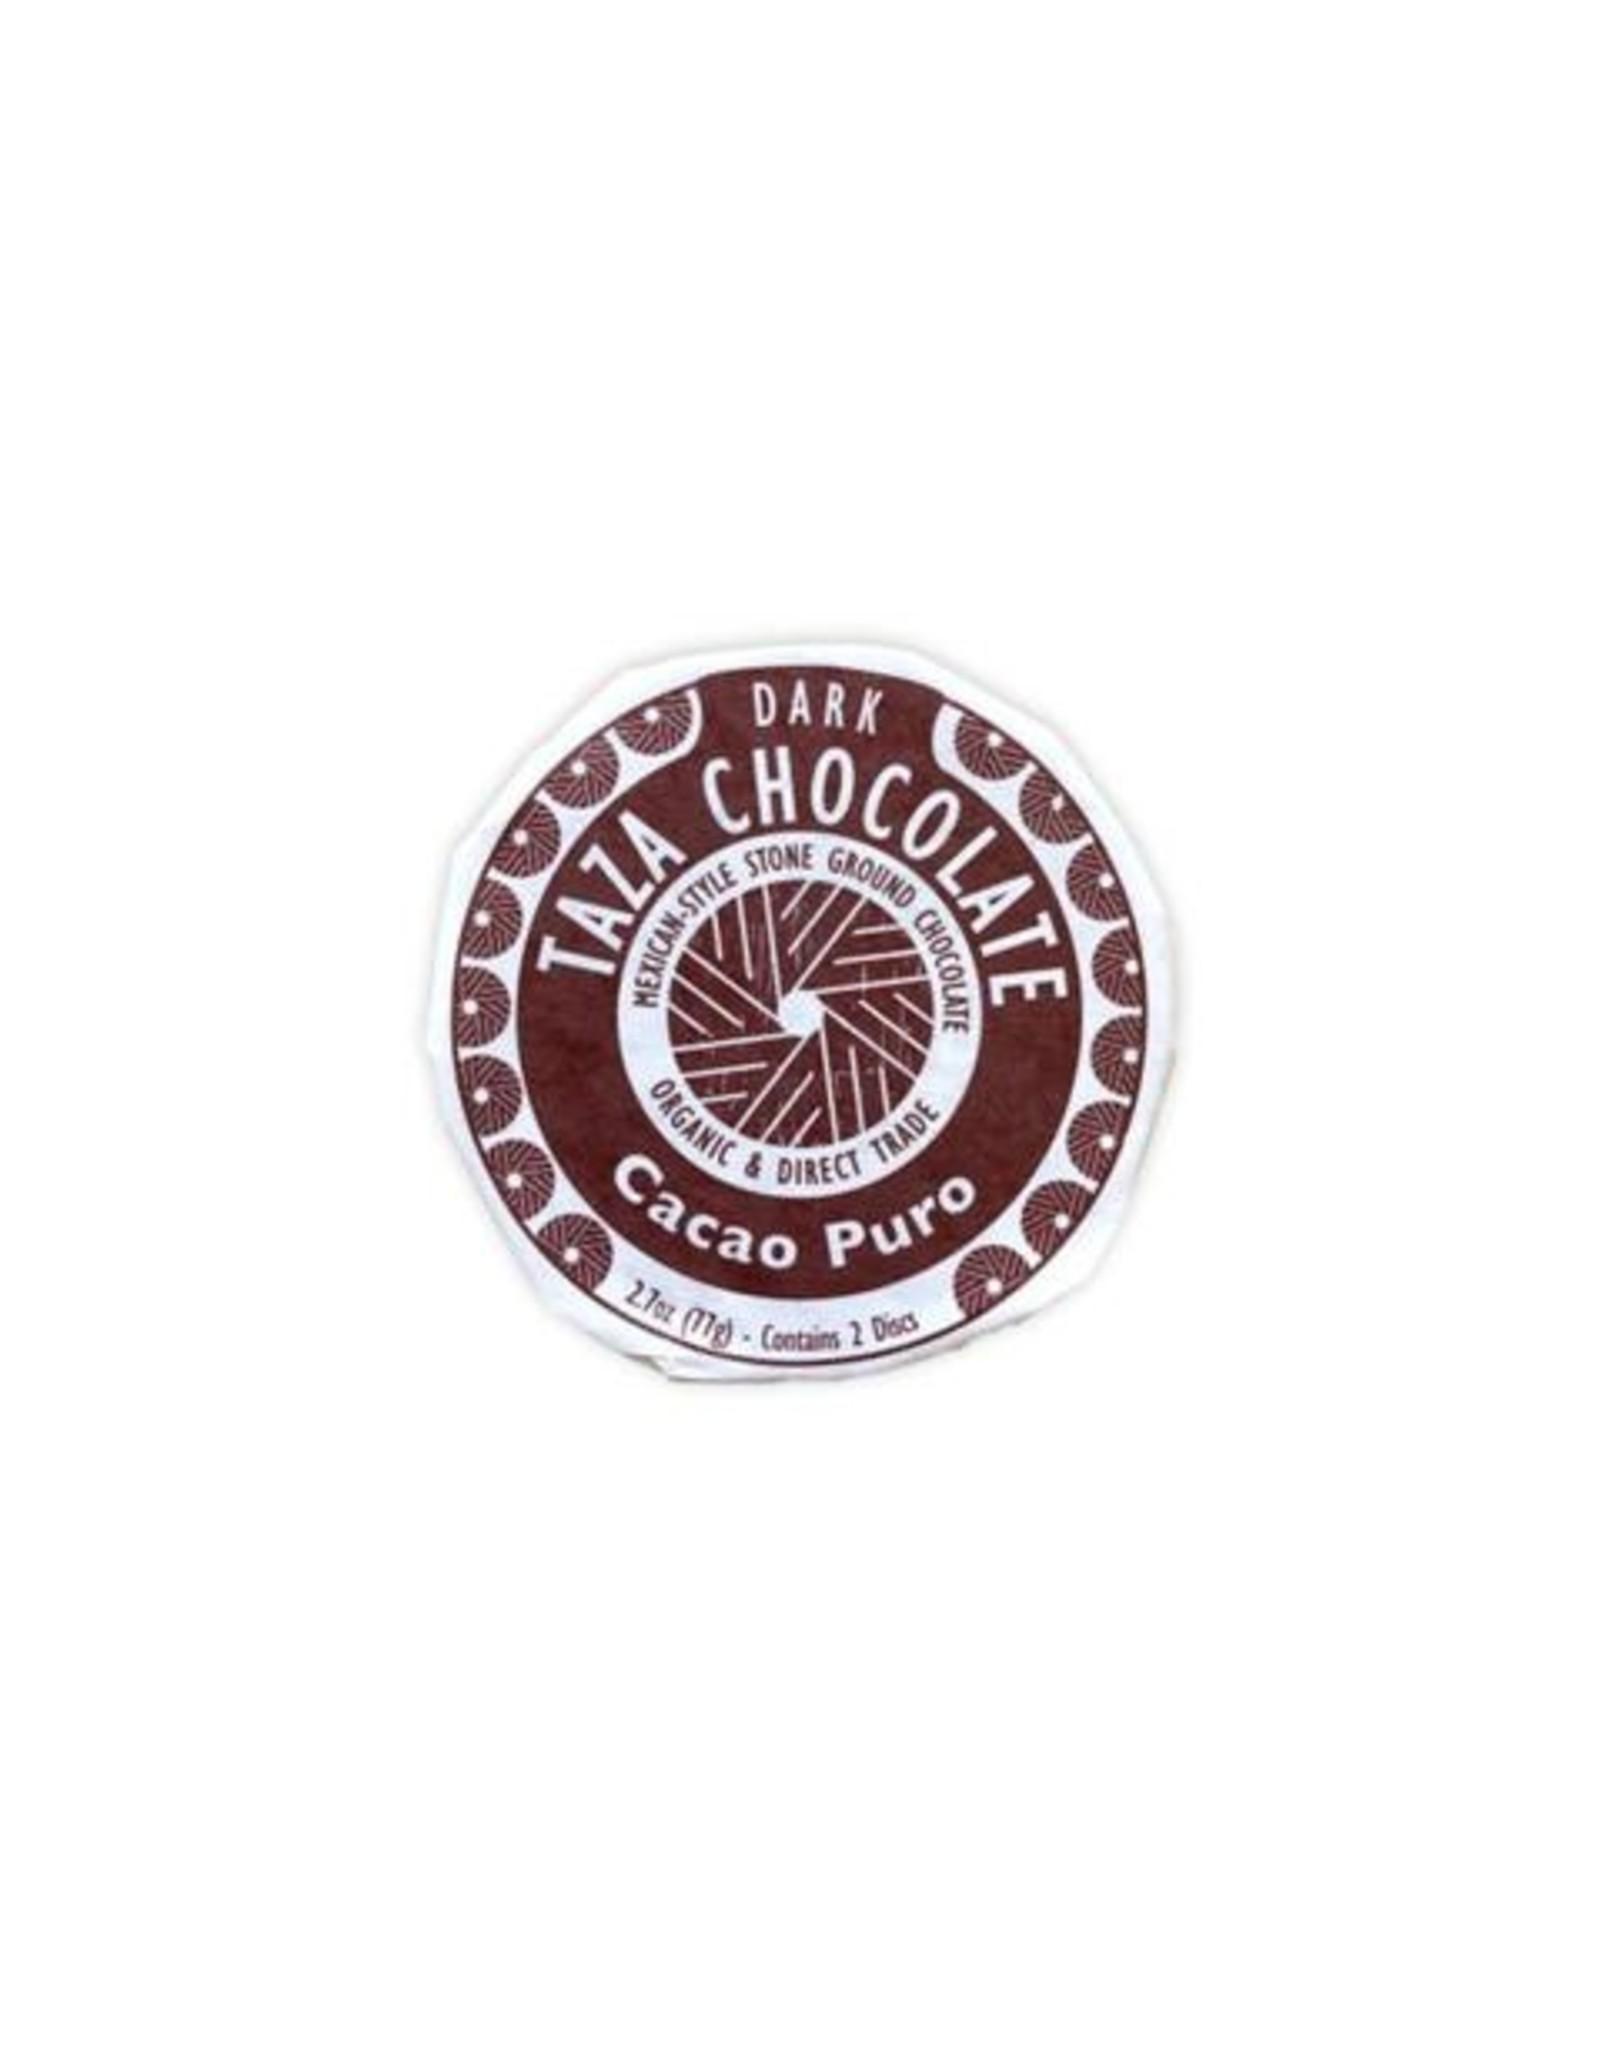 Taza Chocolate Taza Organic Dark Chocolate Disc Cacao Puro